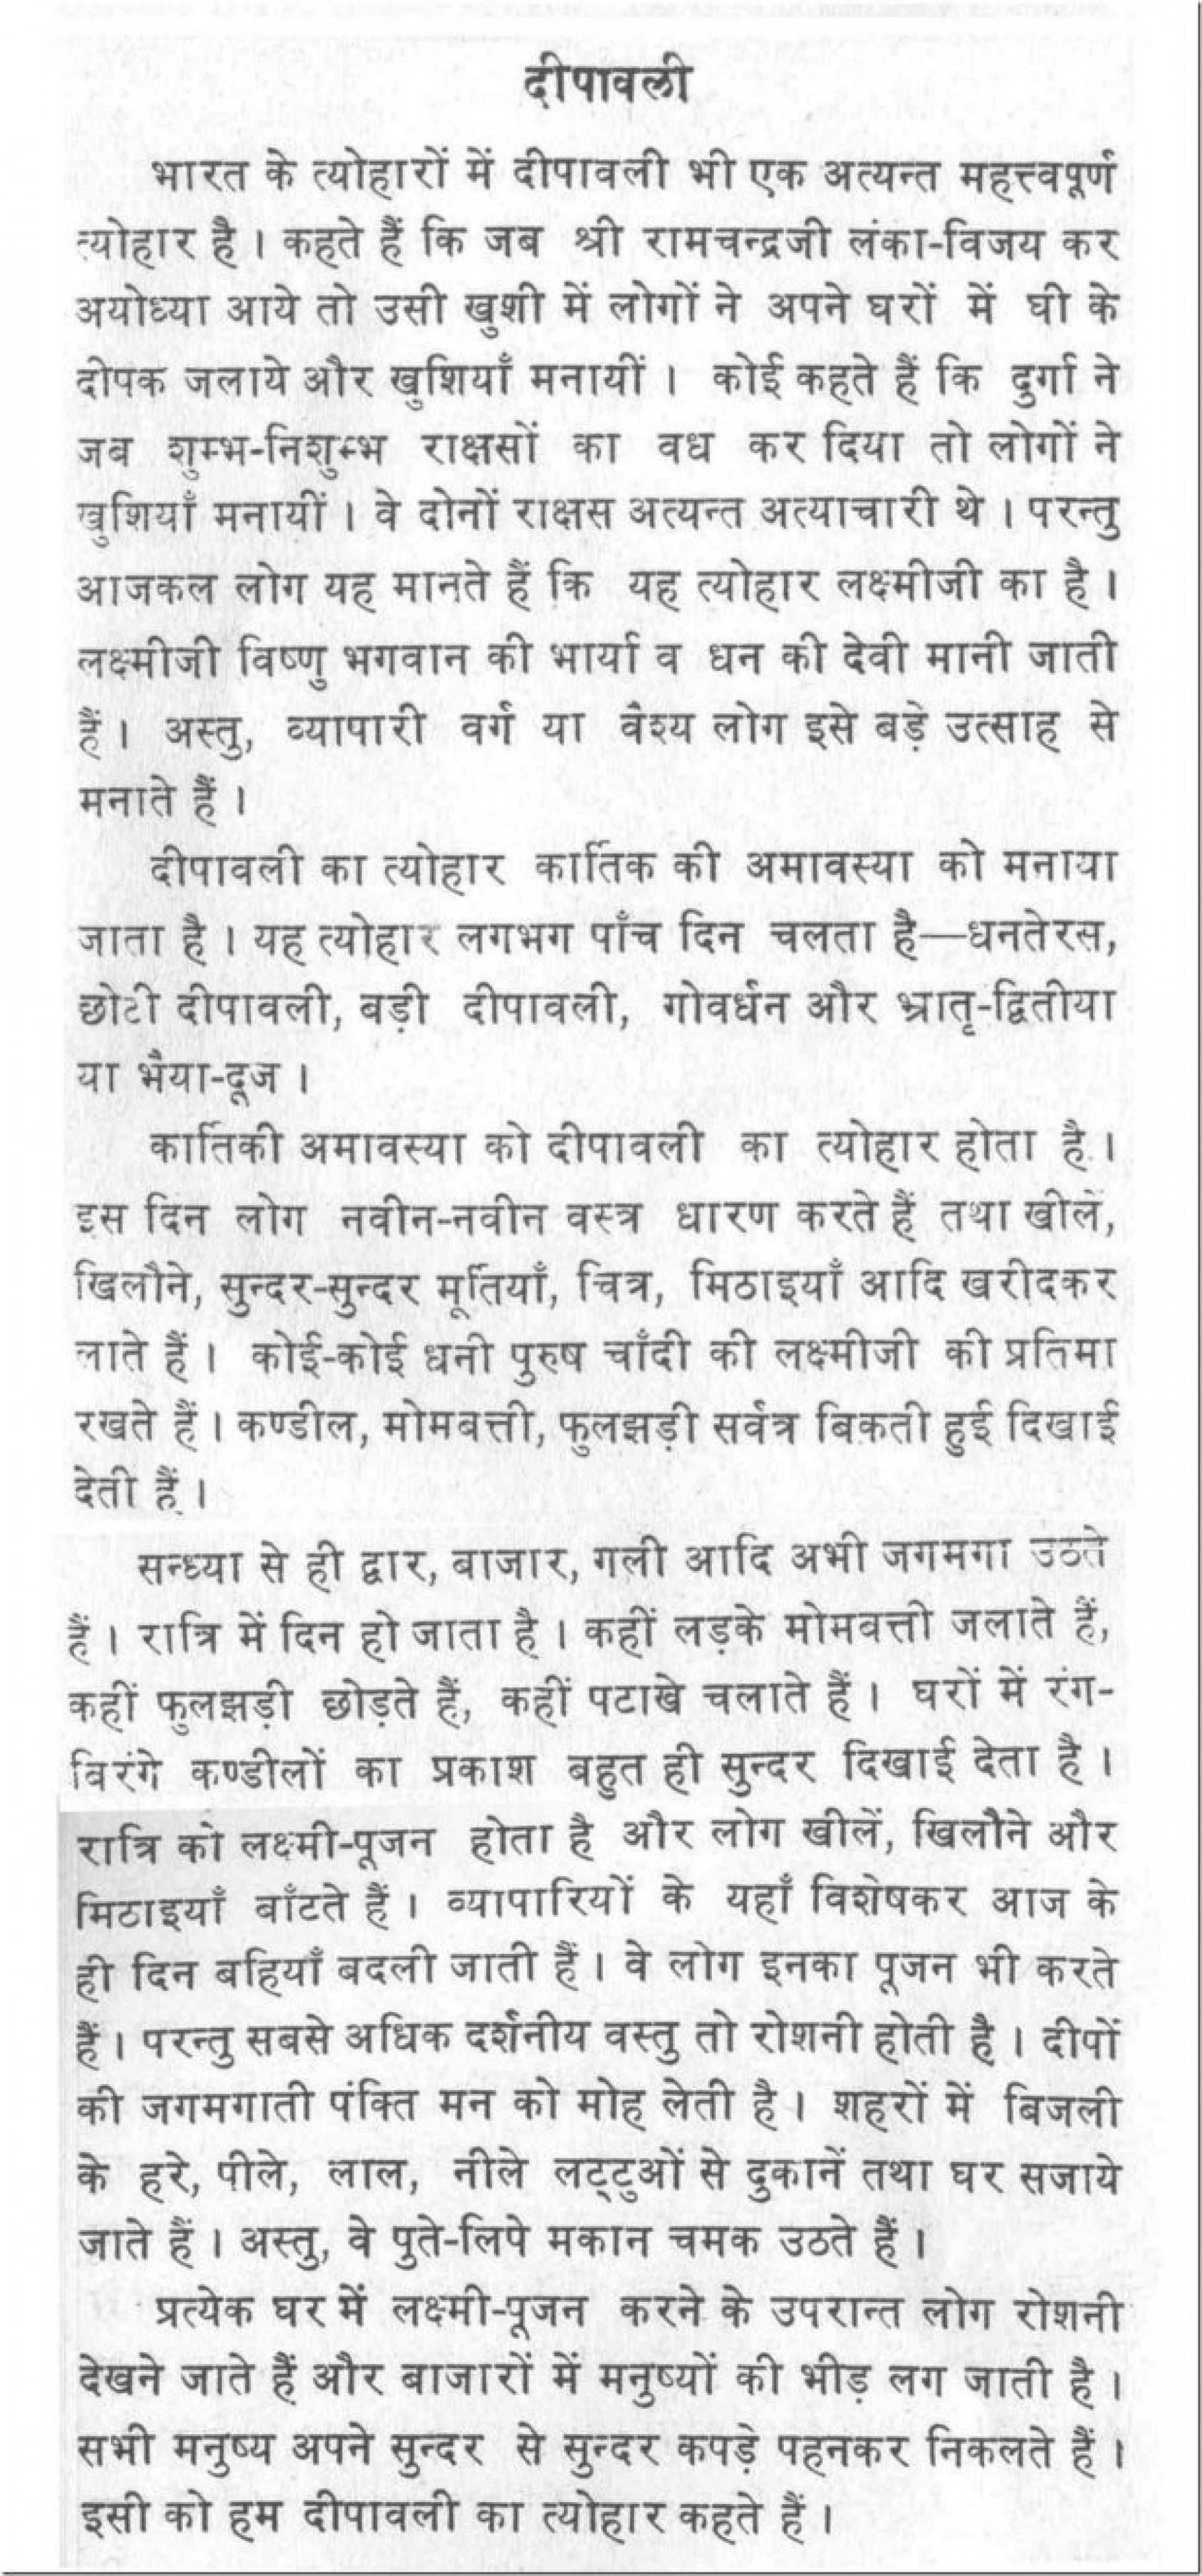 013 Essay Example Diwali Short English Thumb Deepavali In Bengali Marathi About Tamil Kannada Spm Telugu Sanskrit Hindi Mai 618x1325 Unbelievable Festival Christmas Language 1920